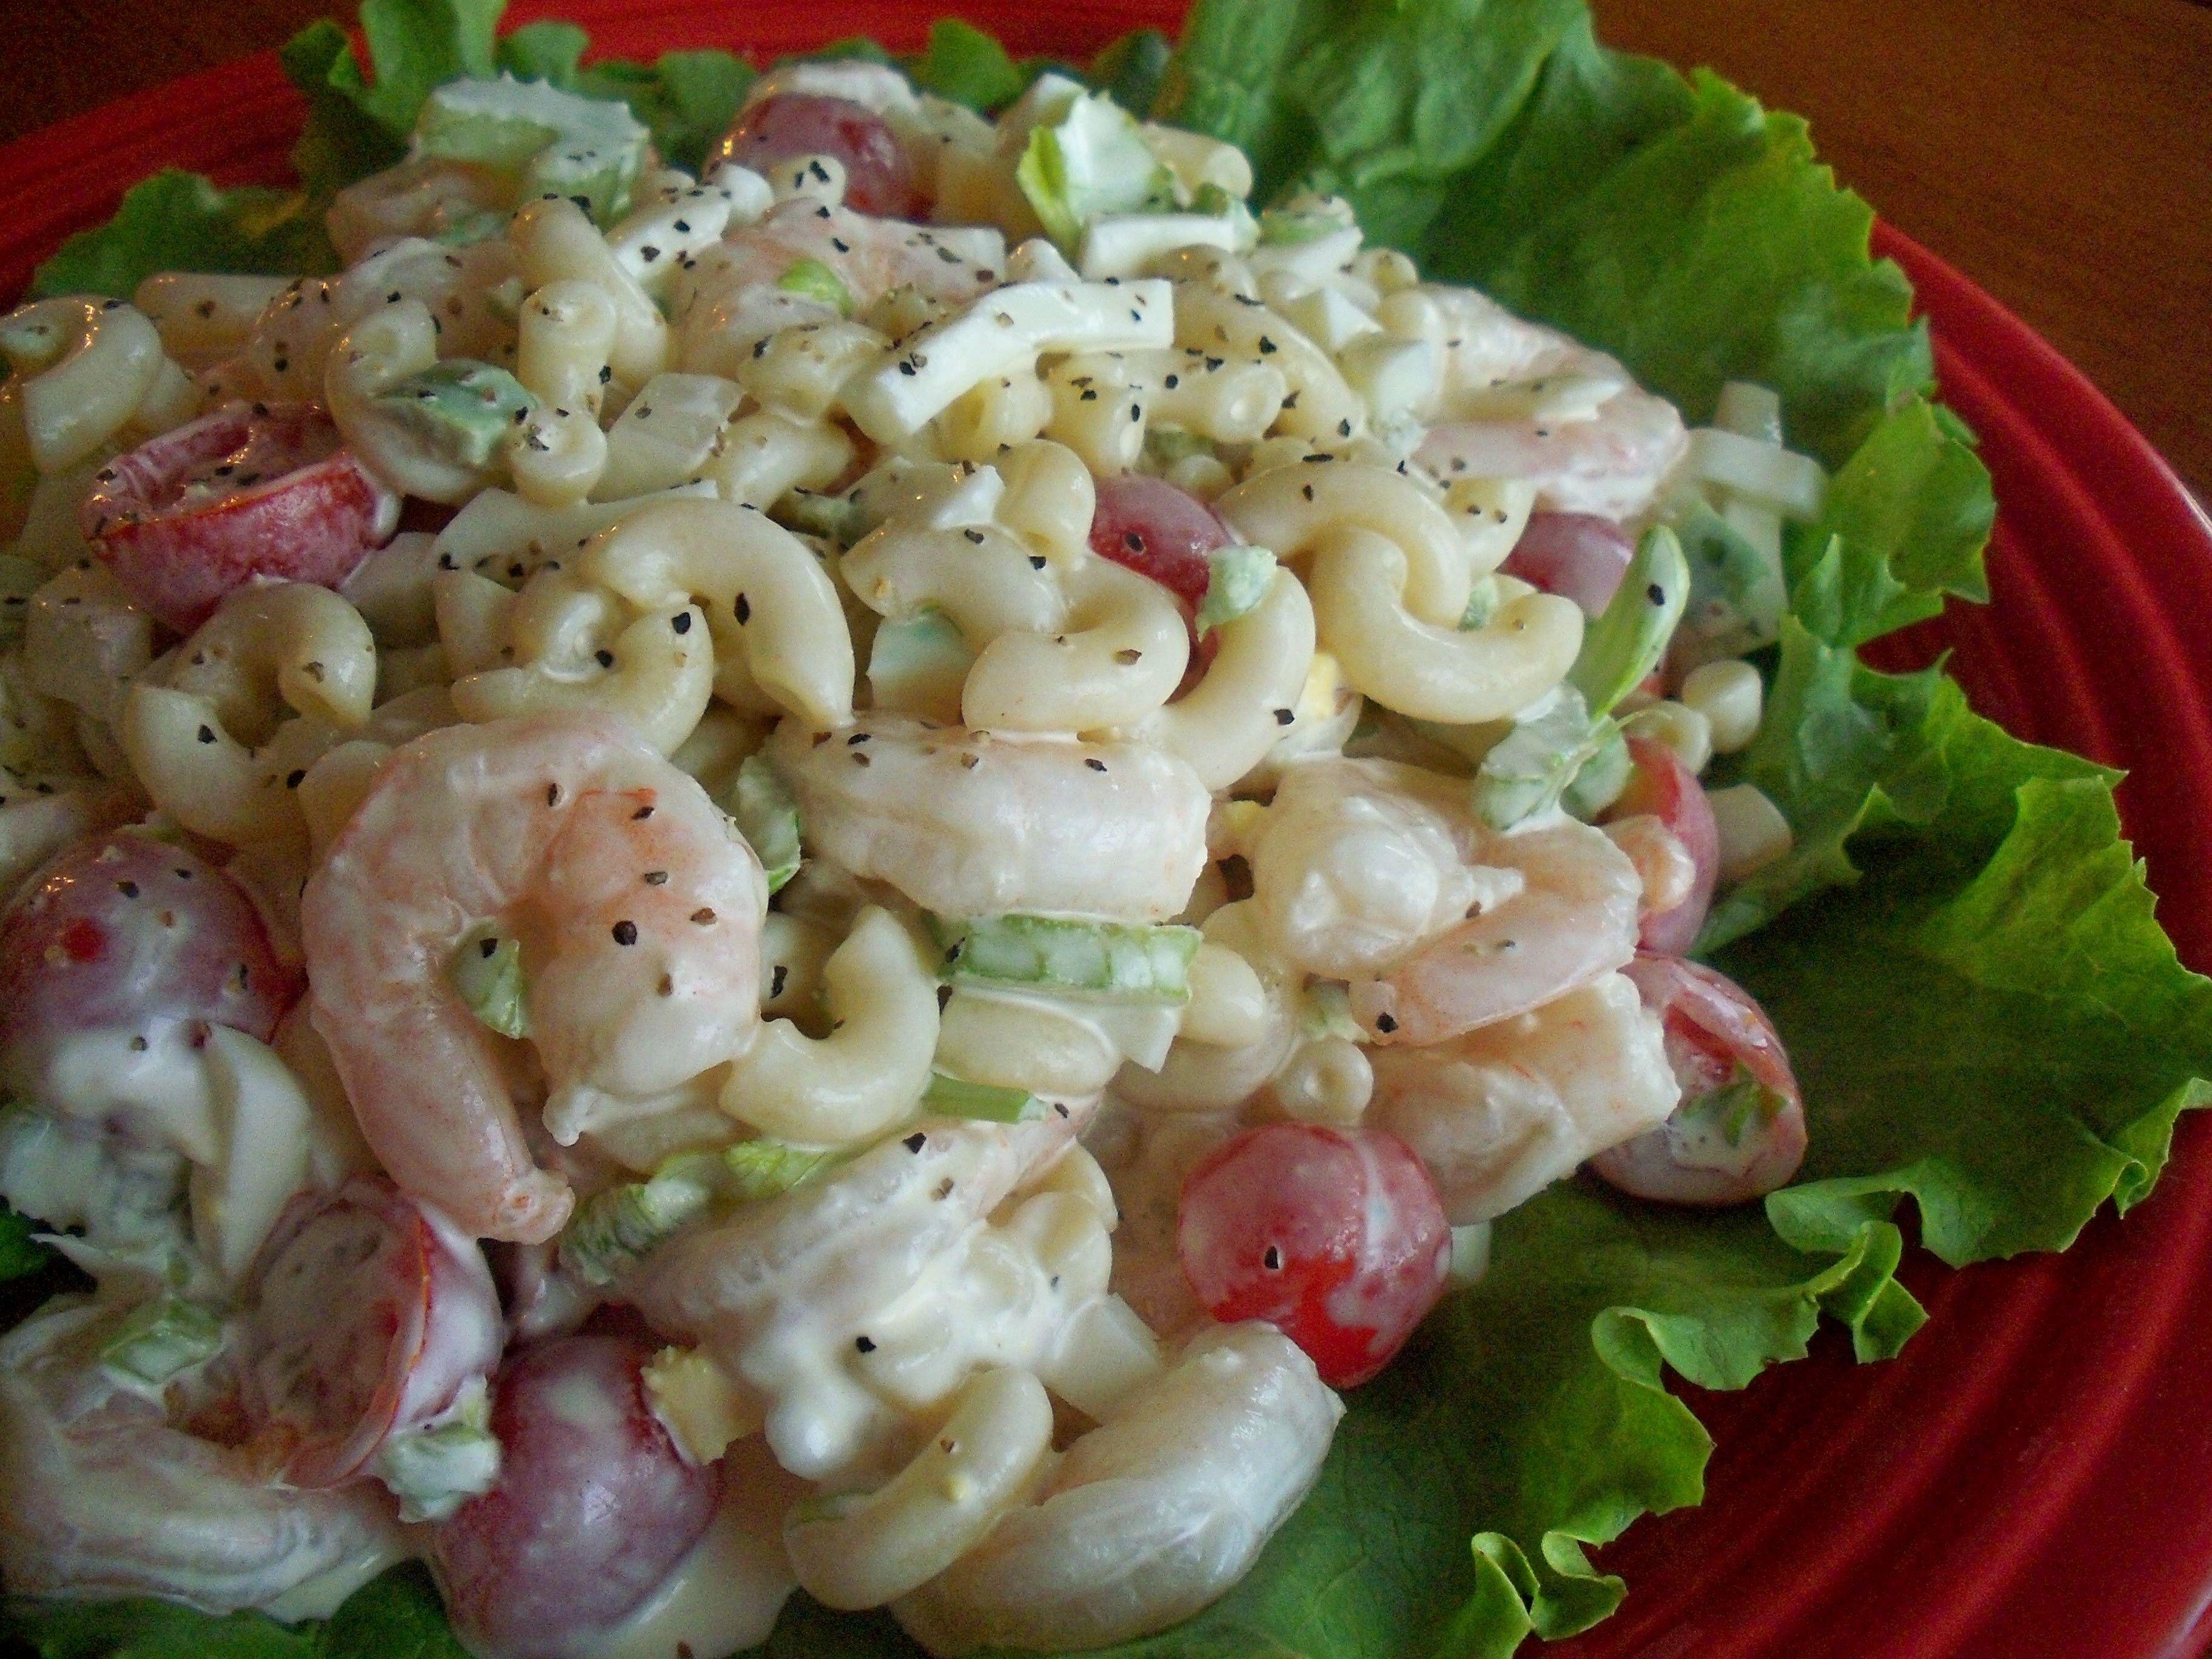 Shrimp Salad Recipe With Elbow Macaroni